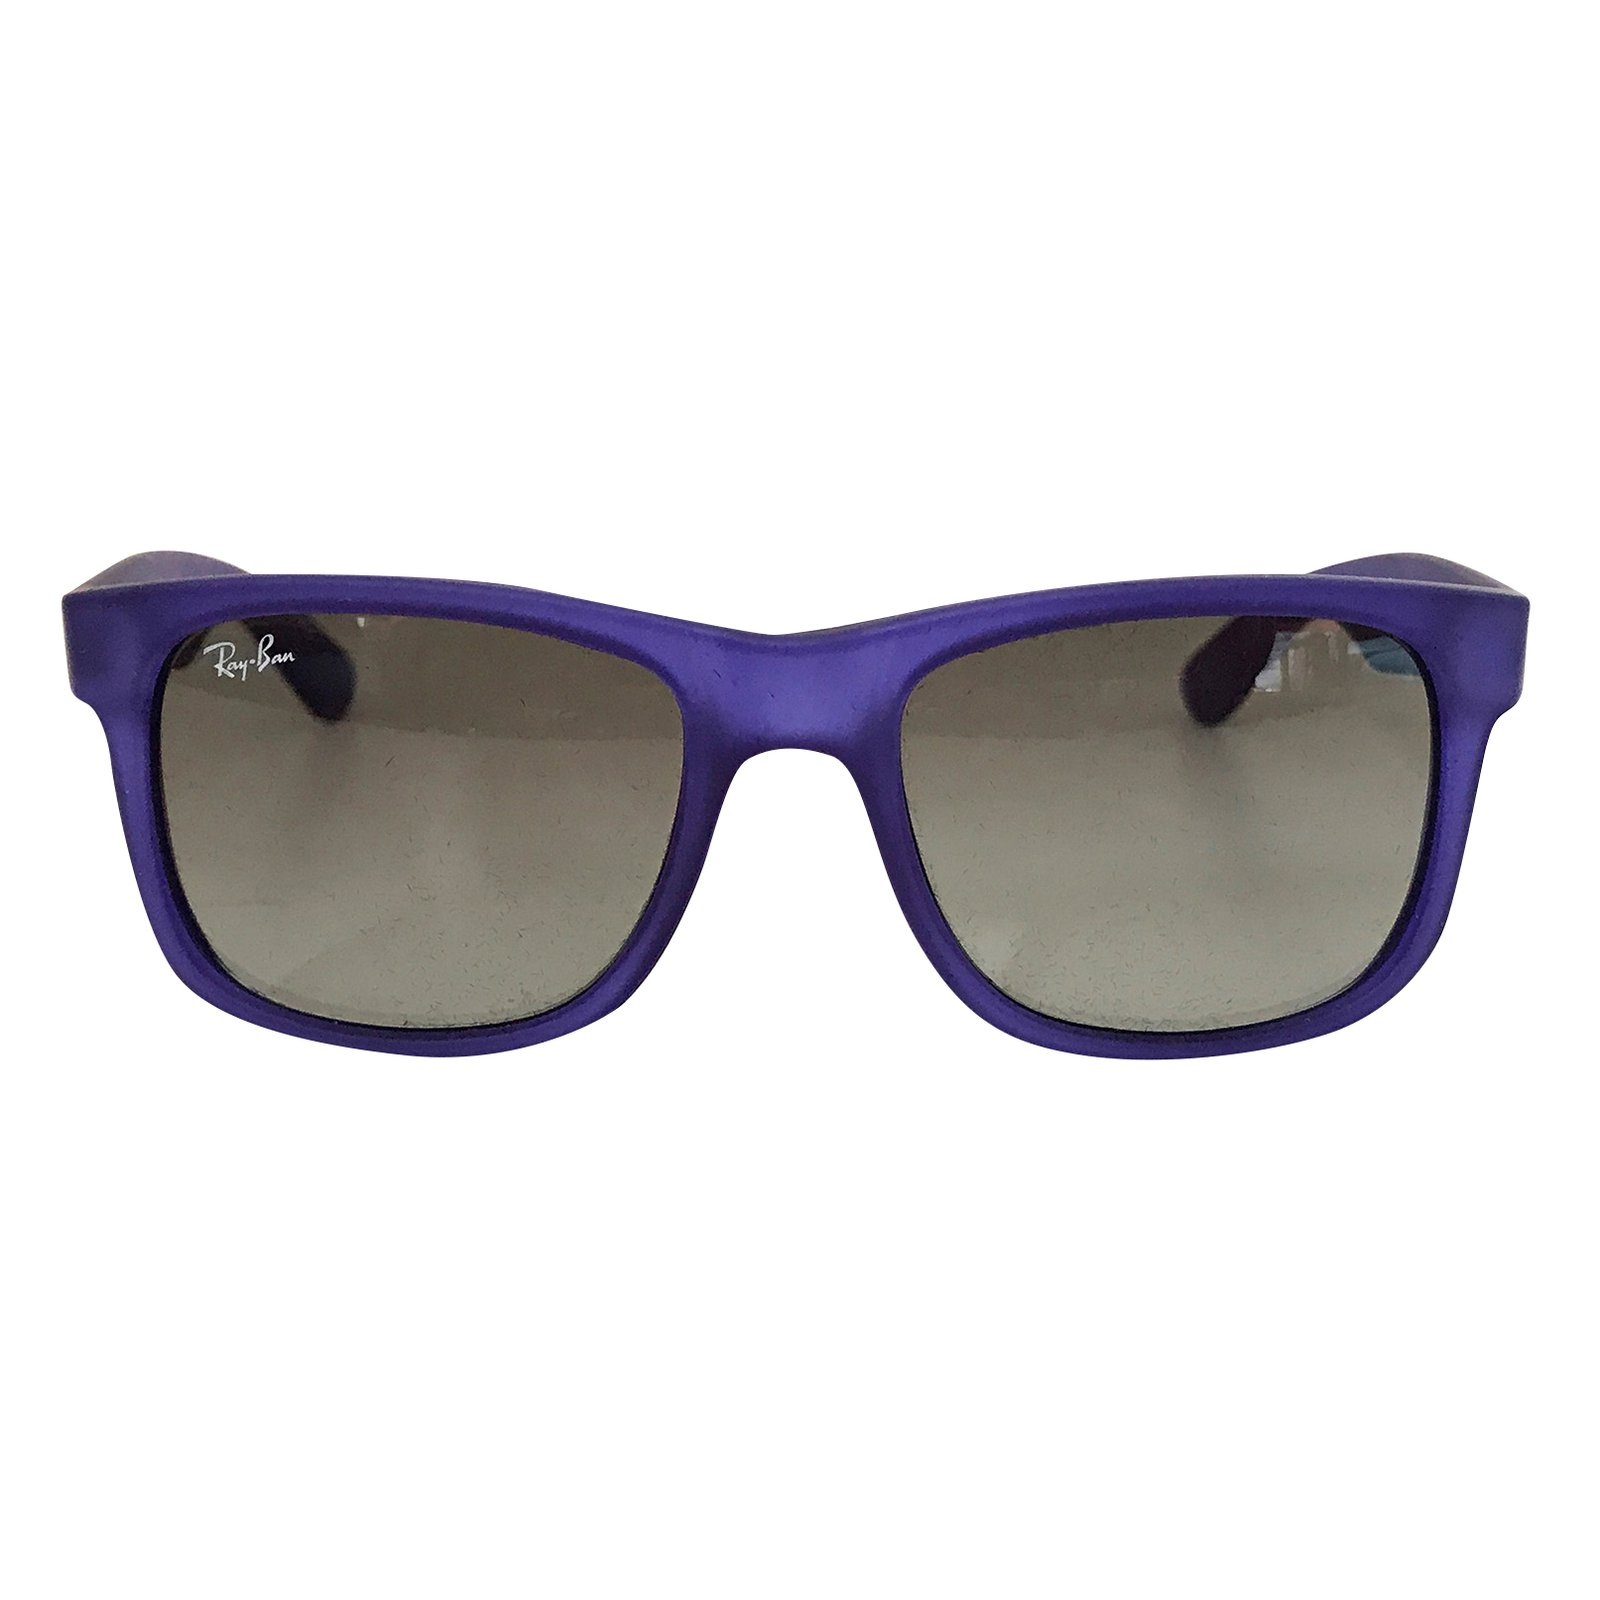 b614d3da107 closeout ray ban rb4165 622 55 black blue mirror 55mm sunglasses c4988  cb2ca  denmark ray ban justin sunglasses plastic blue ref.39913 bbdbf c253c